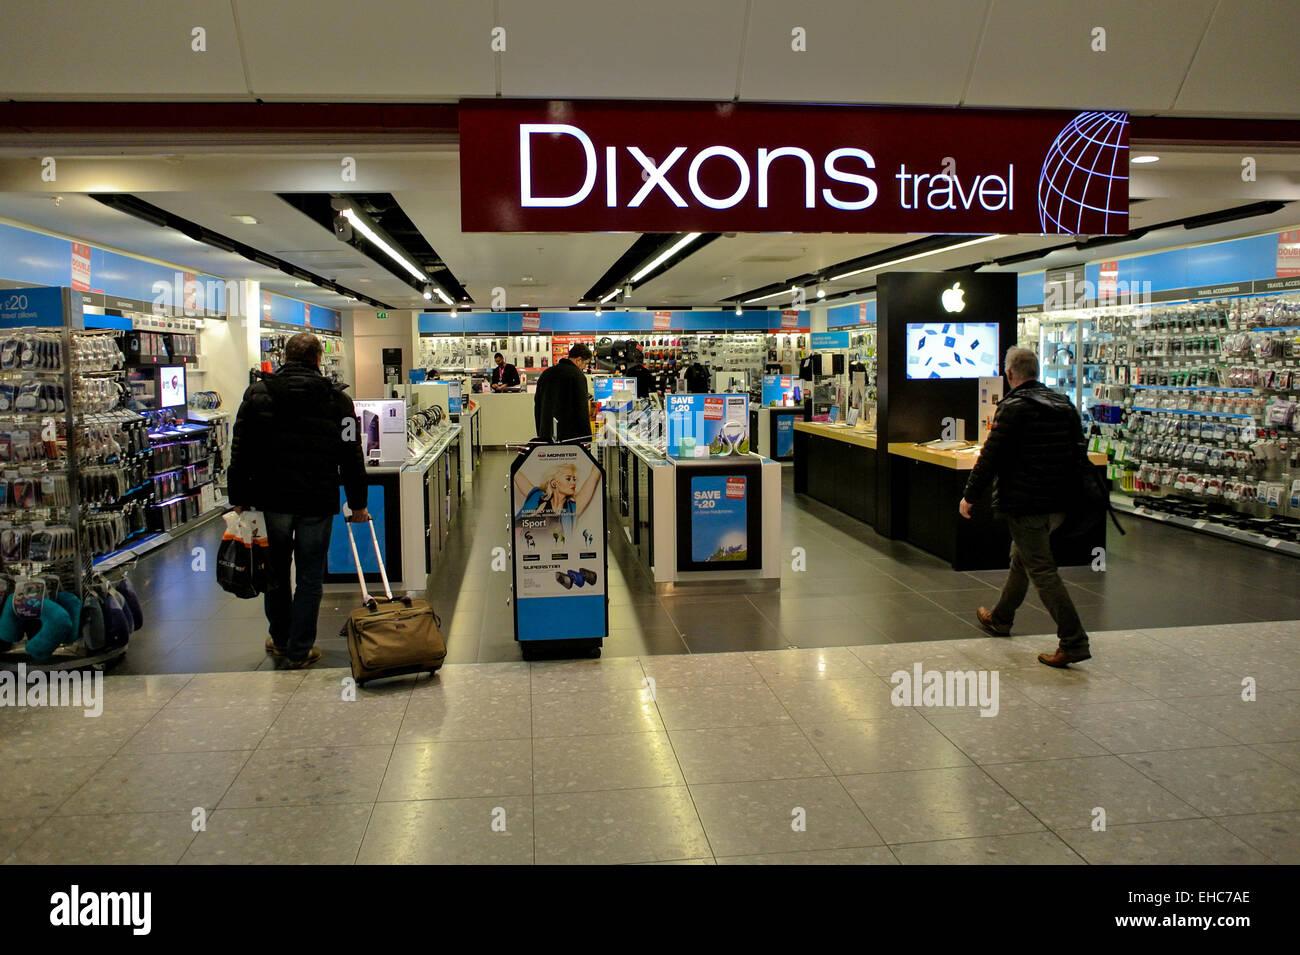 Dixons store at Heathrow Terminal 4 Stock Photo: 79559830